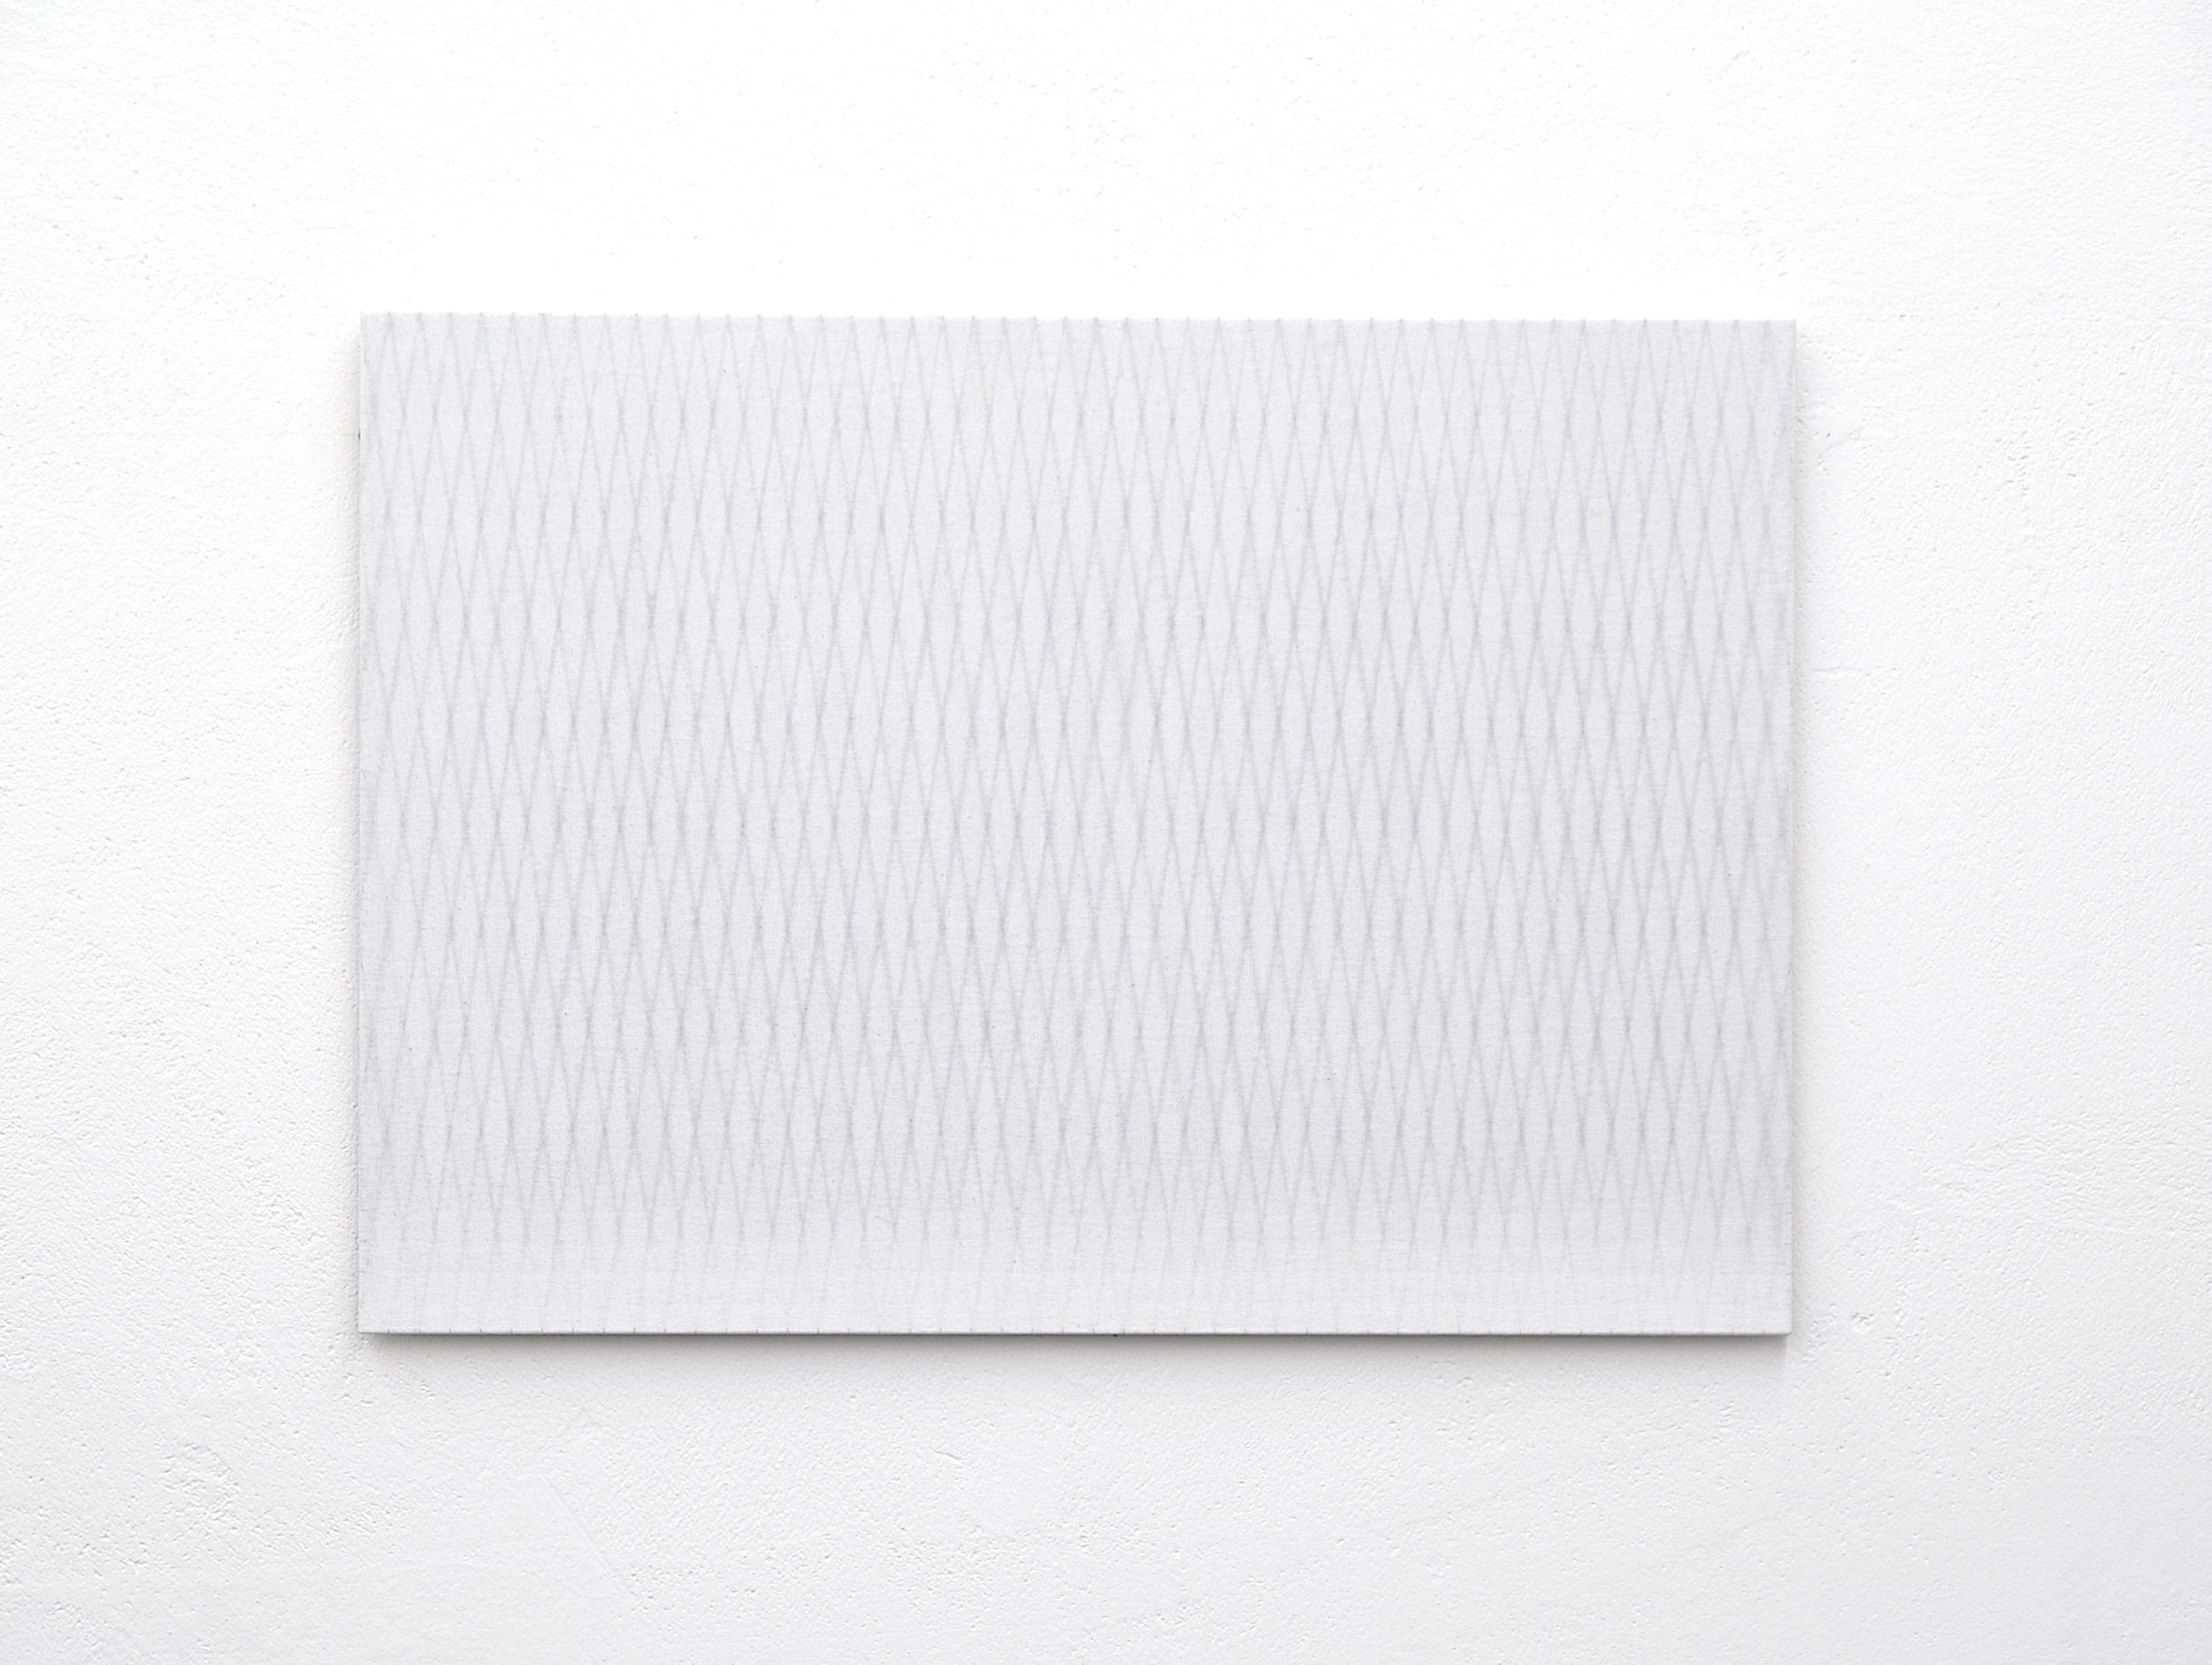 bild nr. 08/2013- 50x 70cm - acryl auf baumwolle/alu